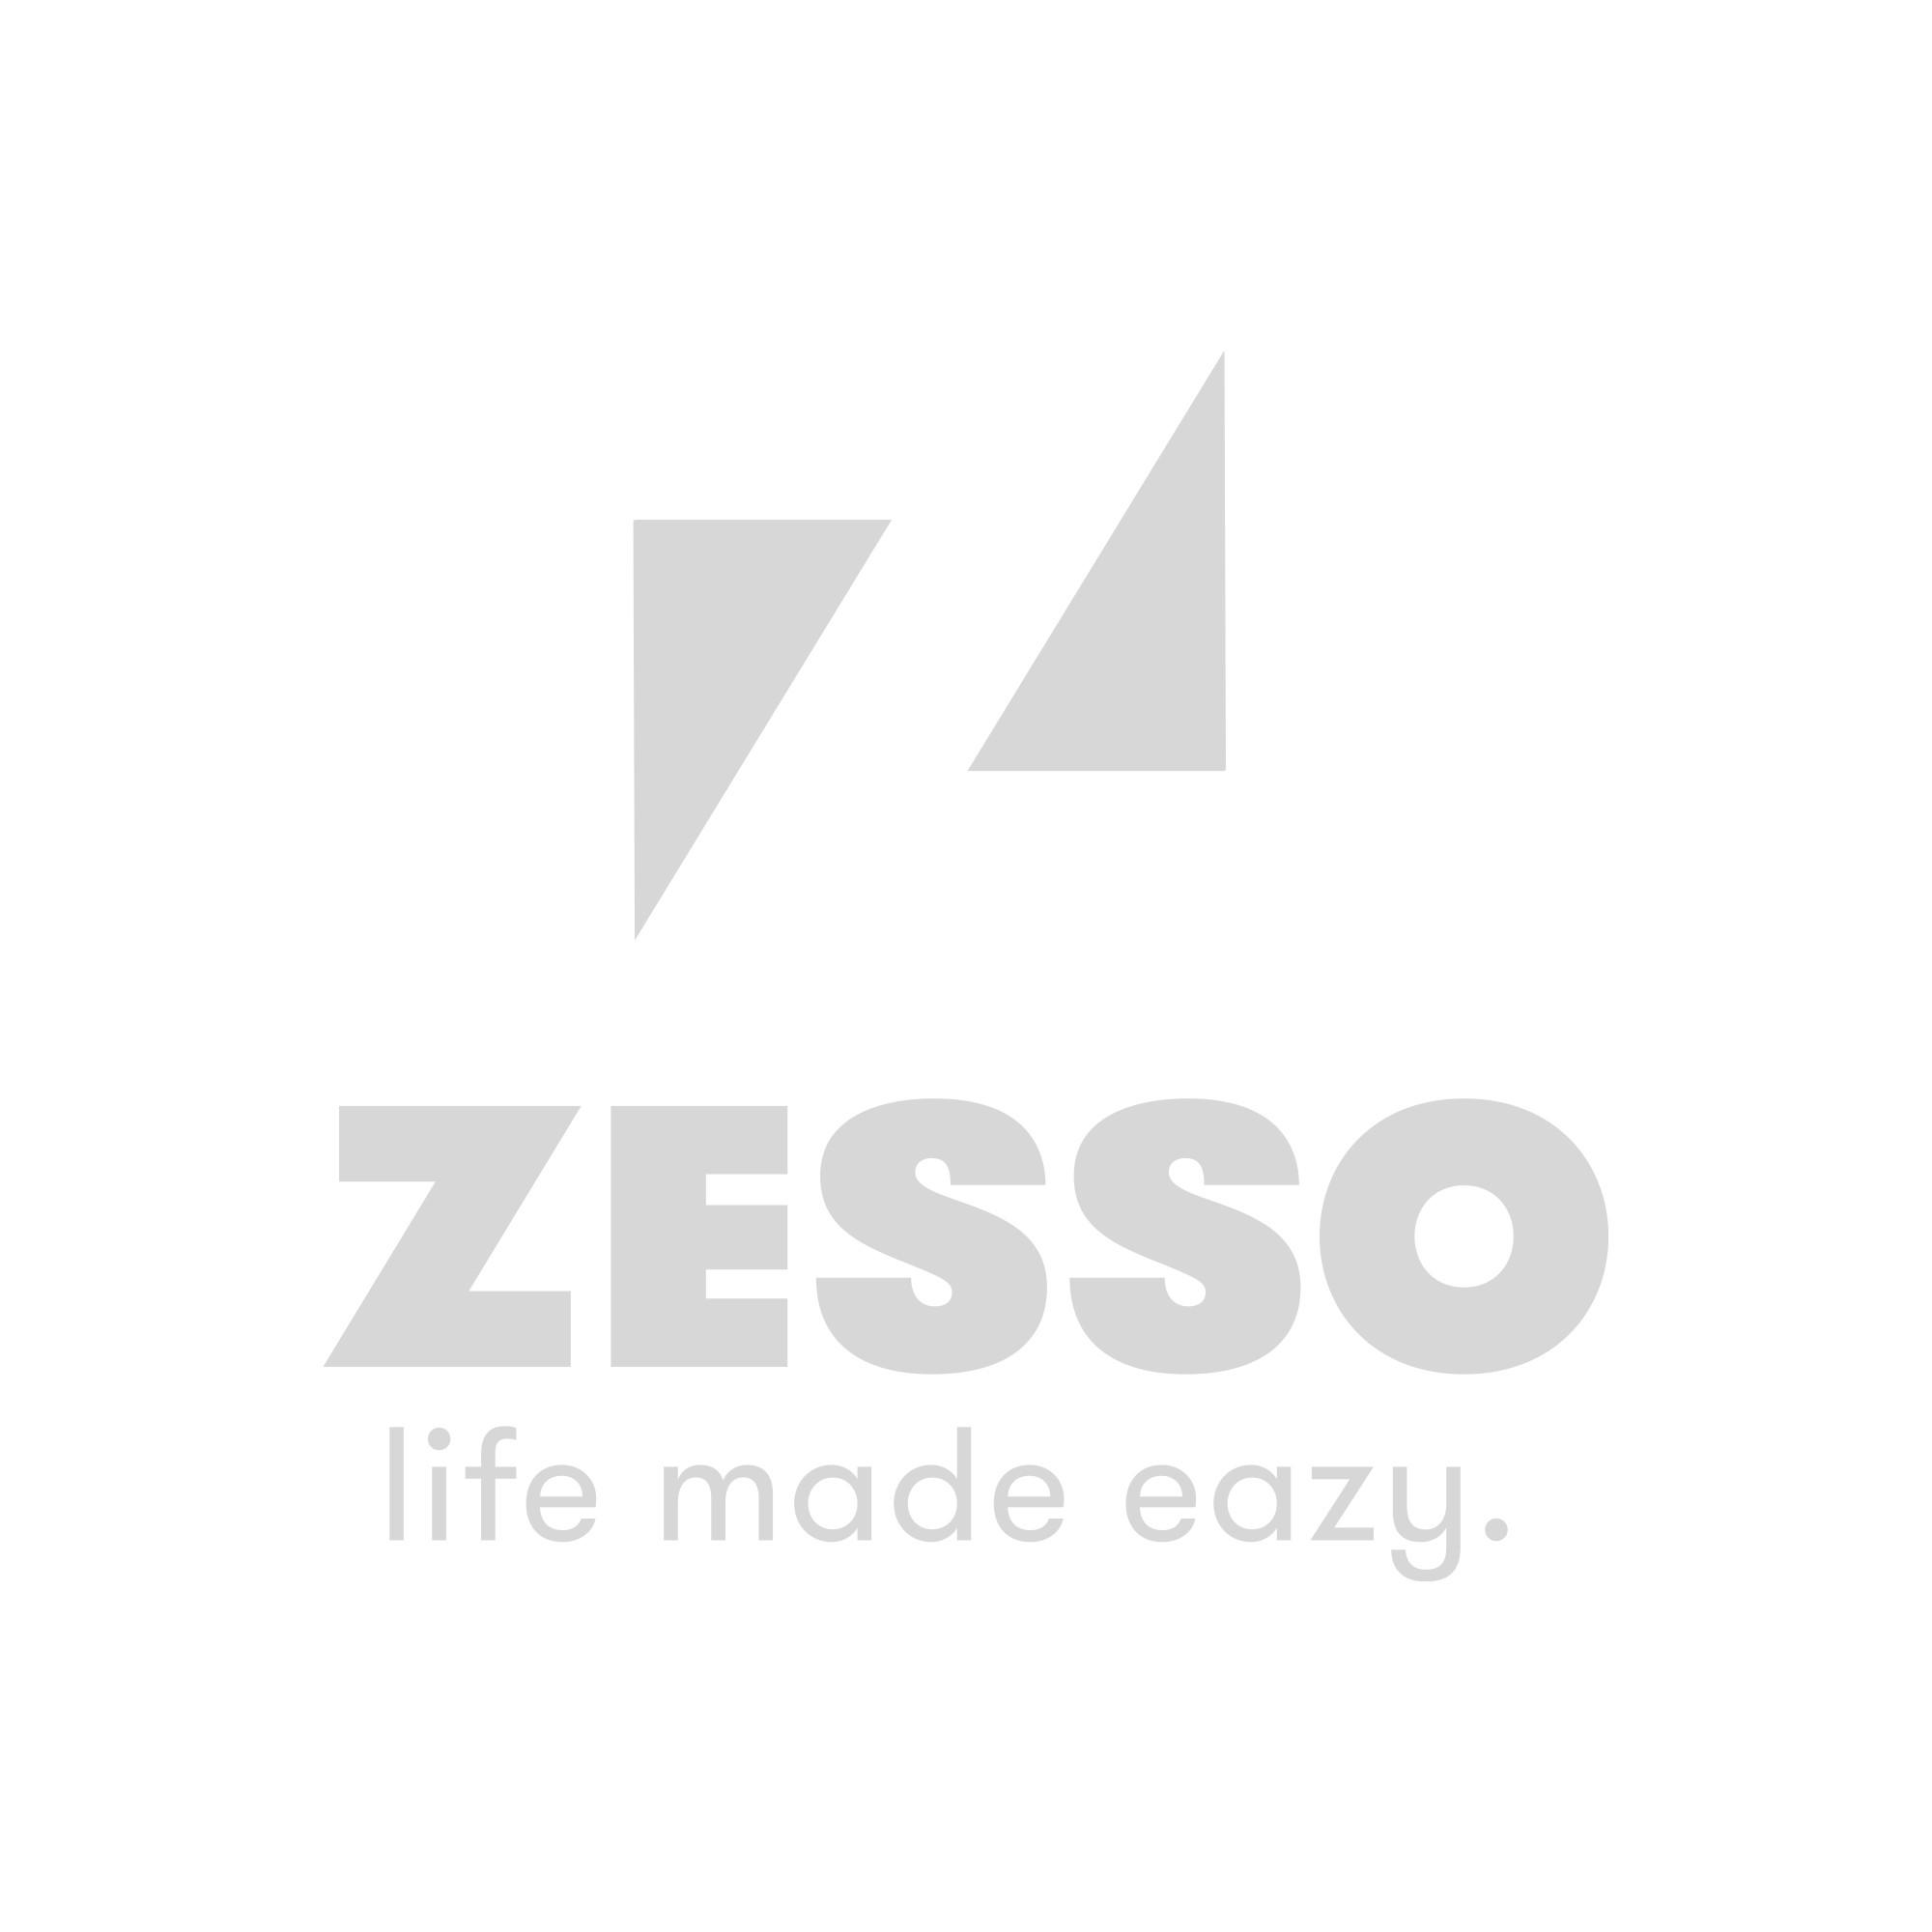 rideau en suede 140 cm x 240 cm clara gris clair